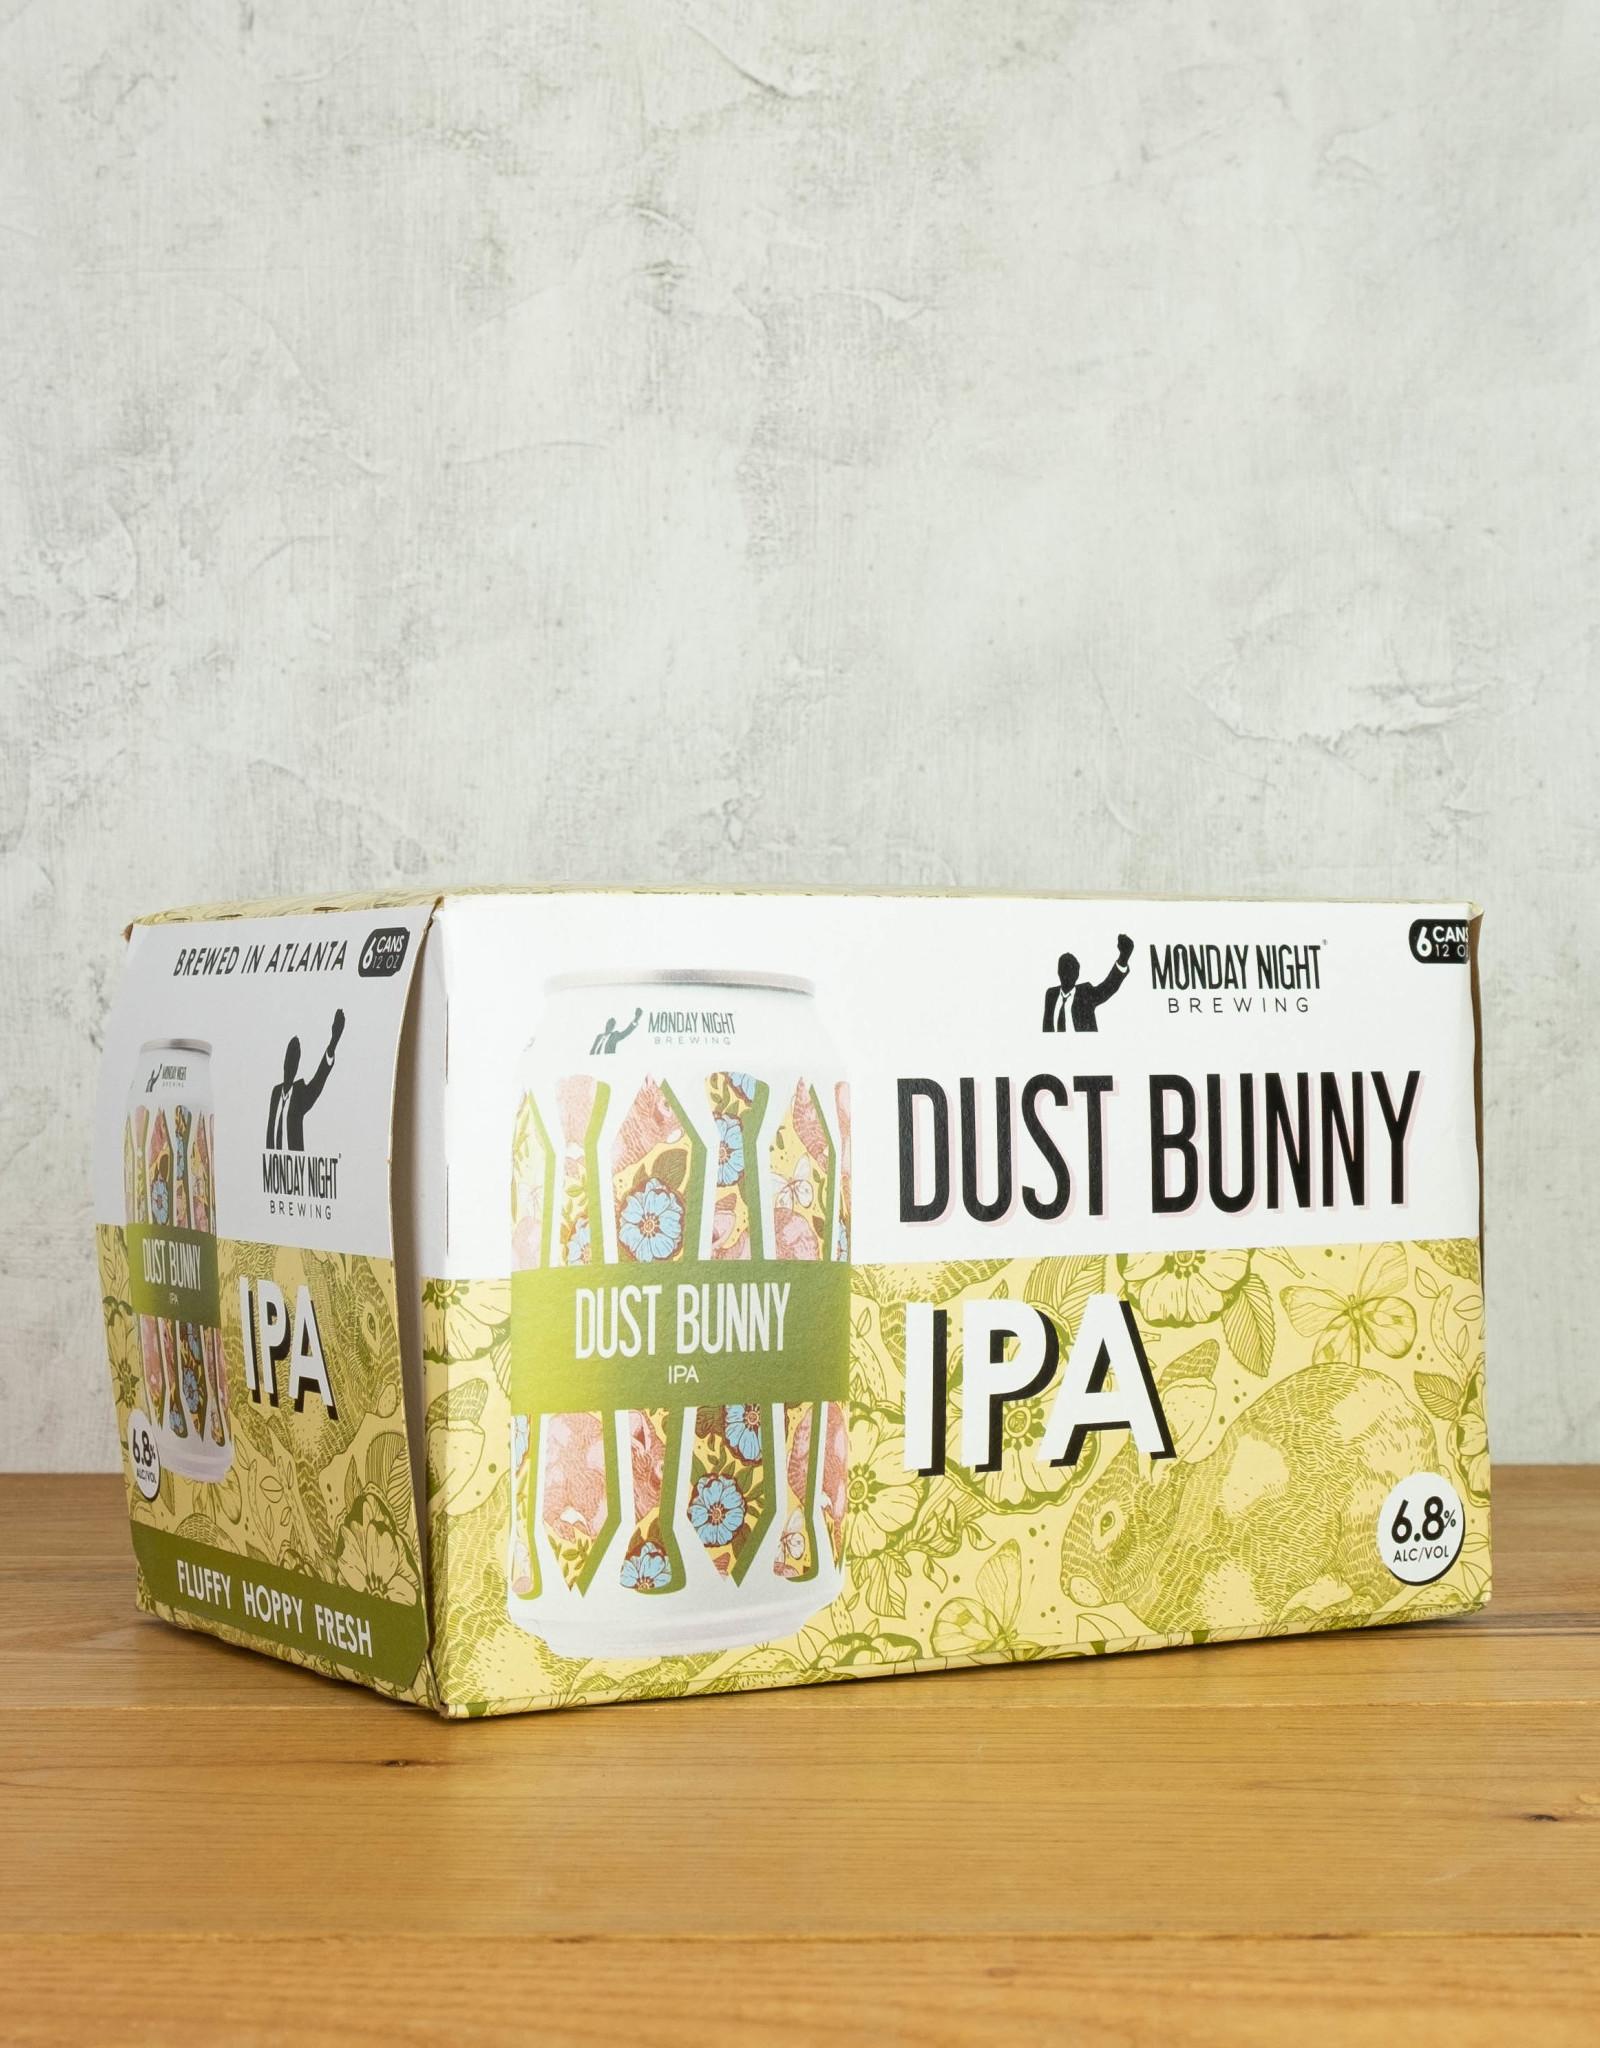 Monday Night Brewing Dust Bunny 6pk